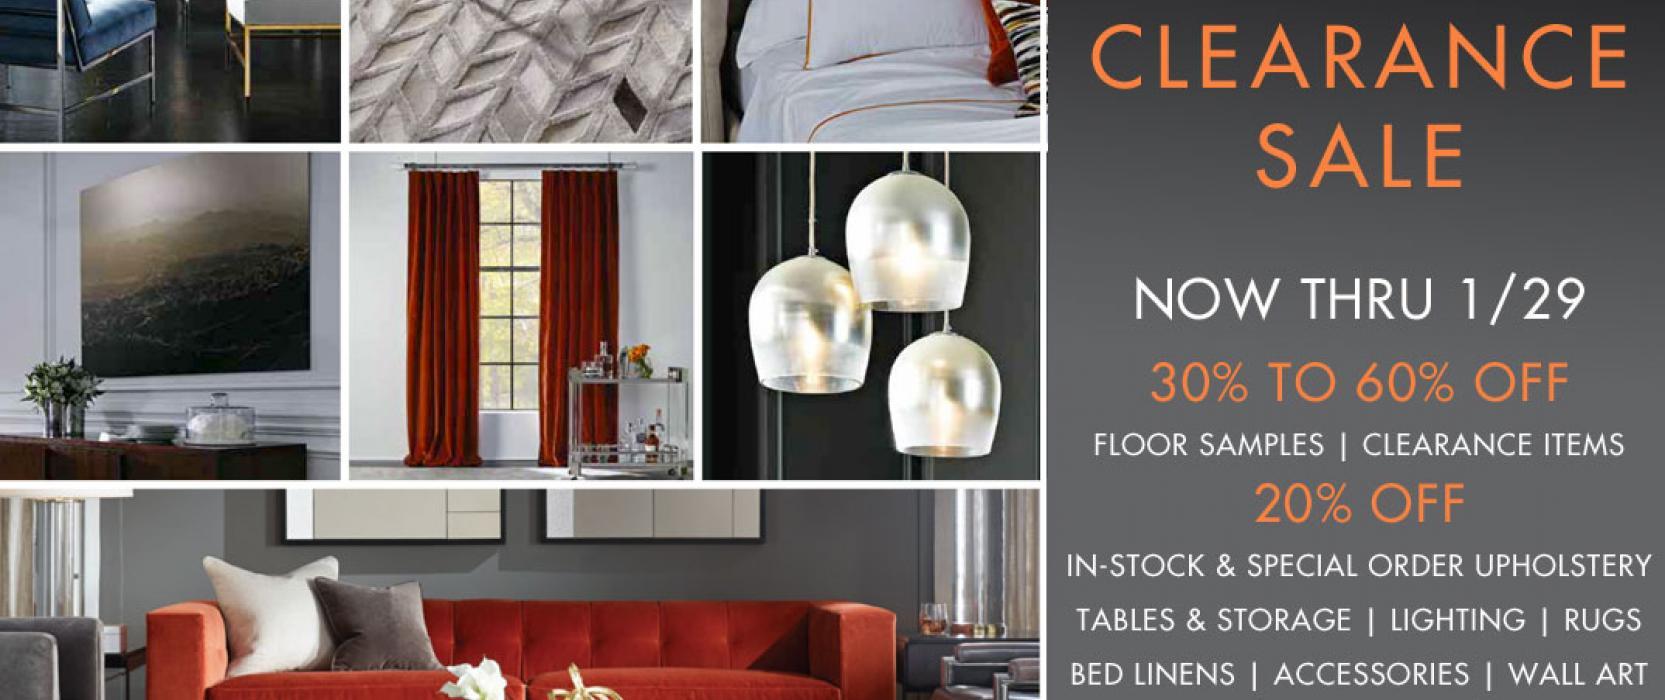 Internationally-acclaimed home furnishings brand Boston